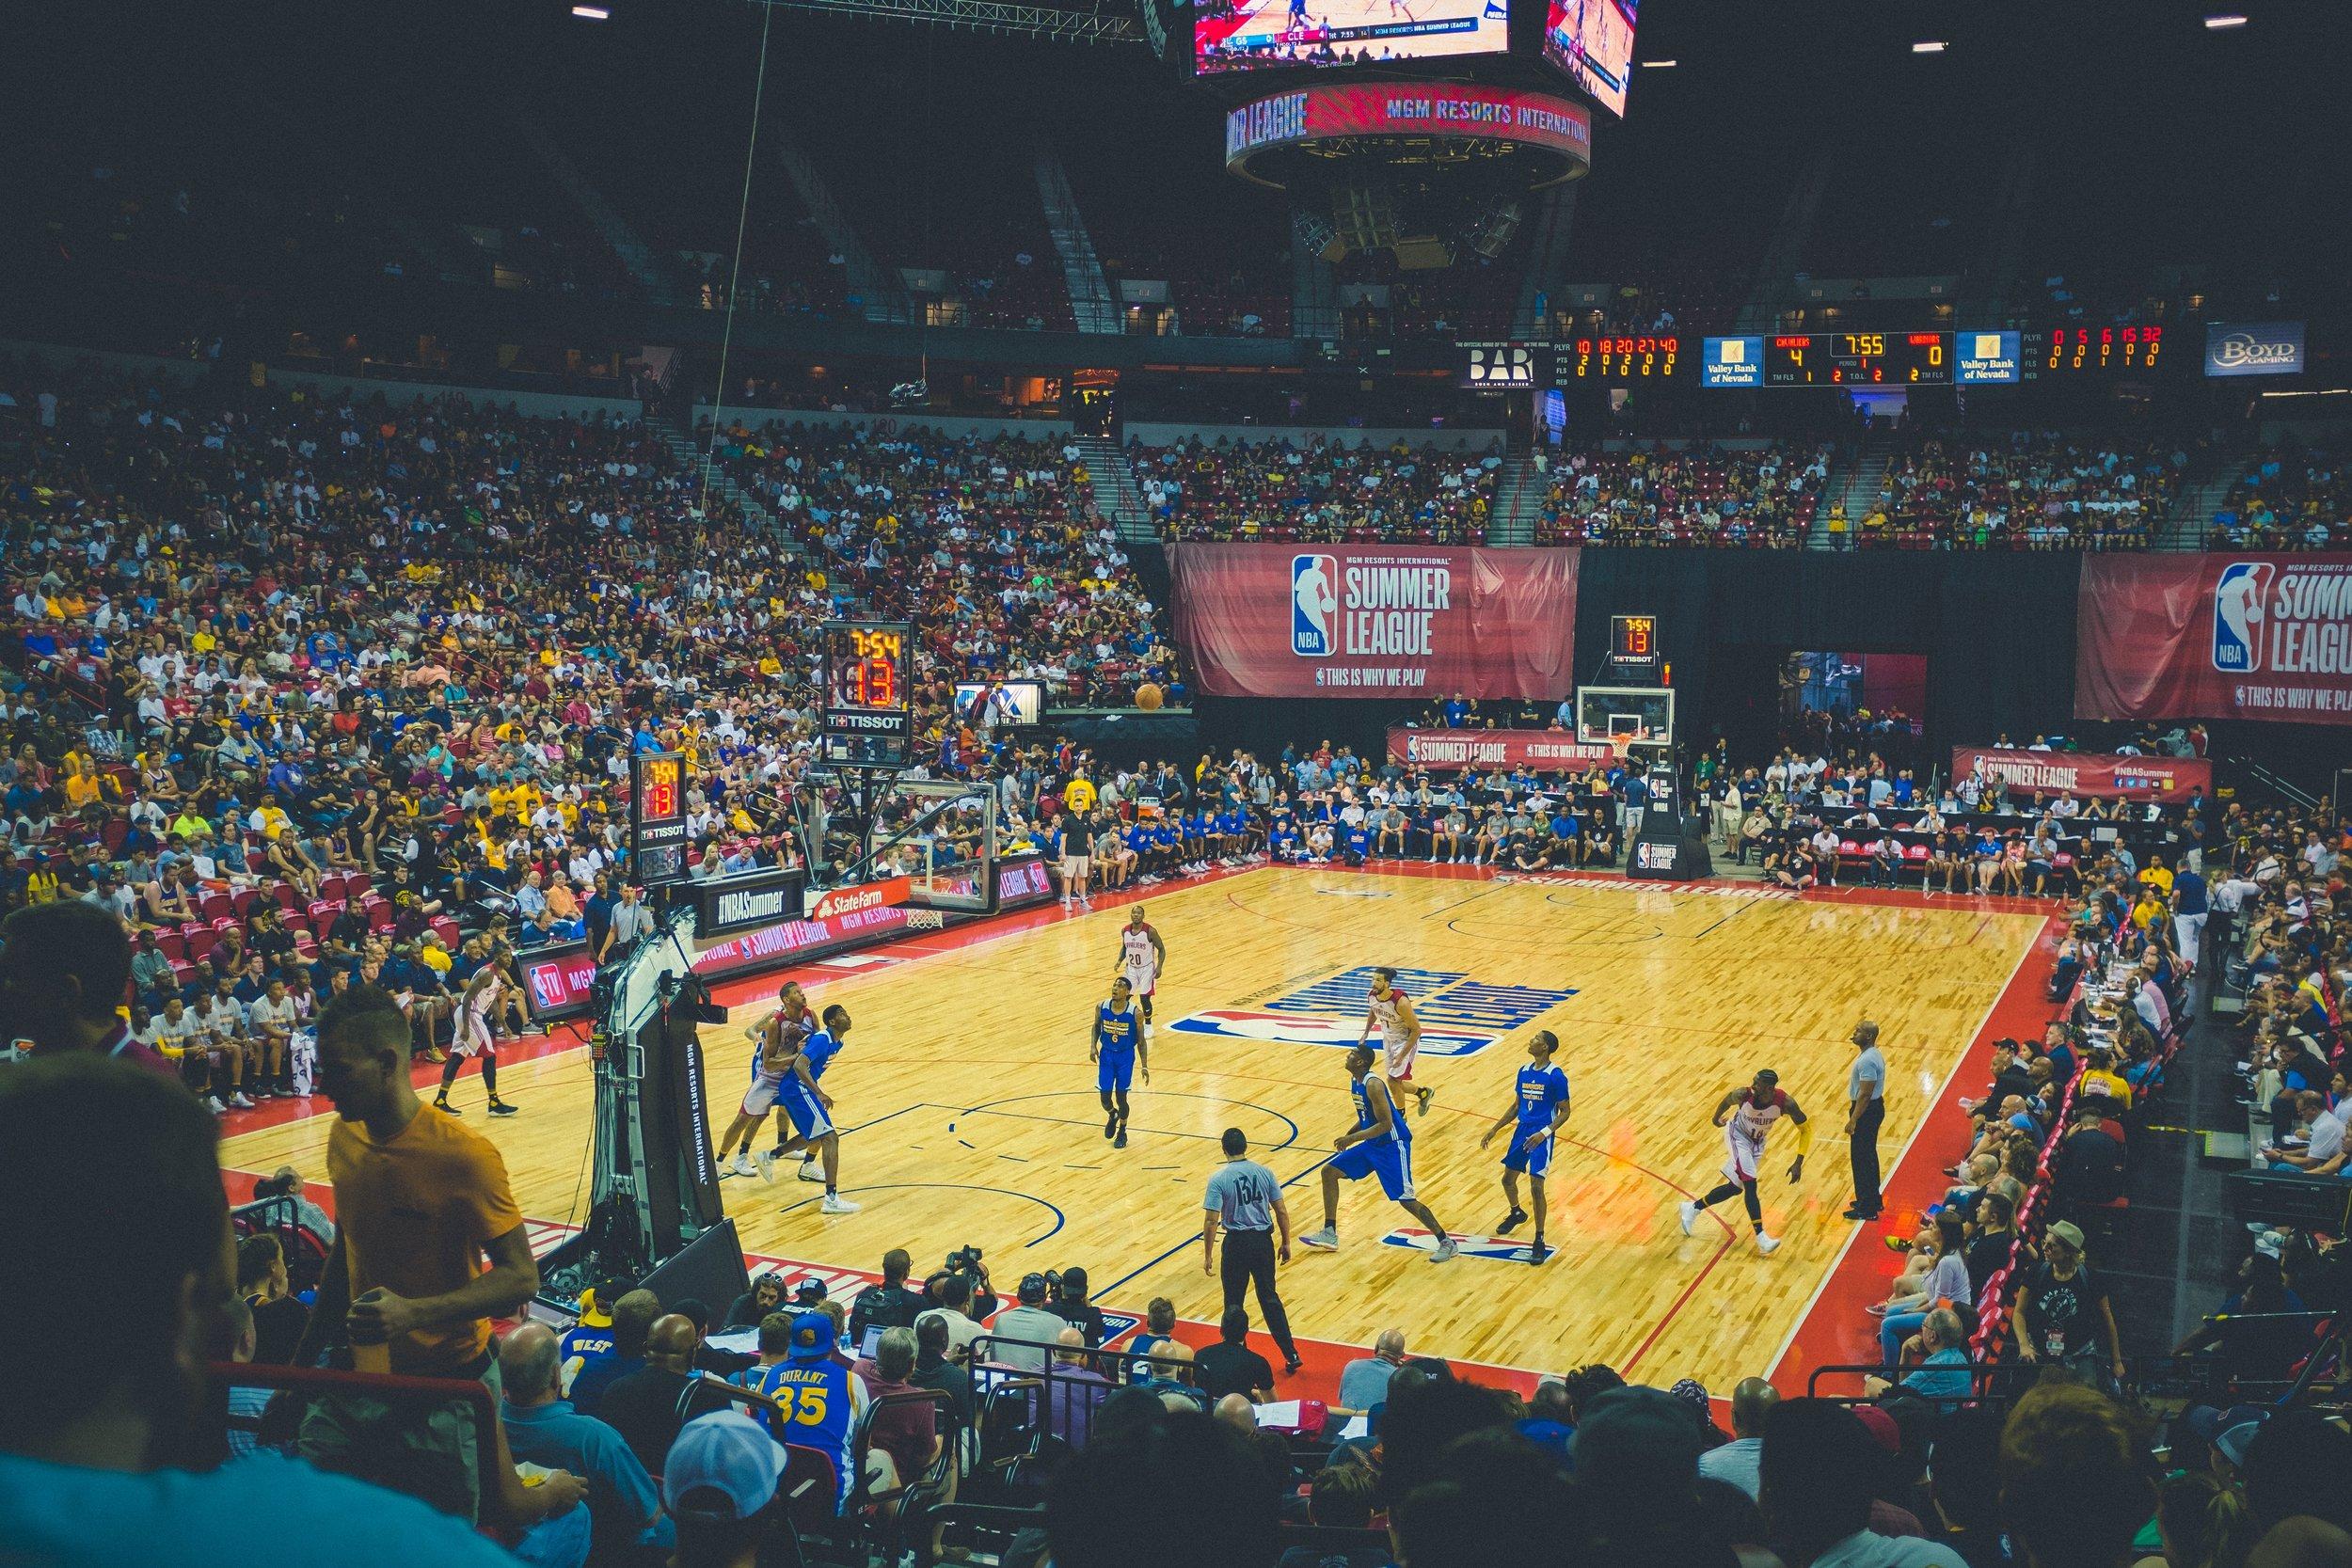 neonbrand-308156-unsplash Las Vegas NBA Summer League.jpg